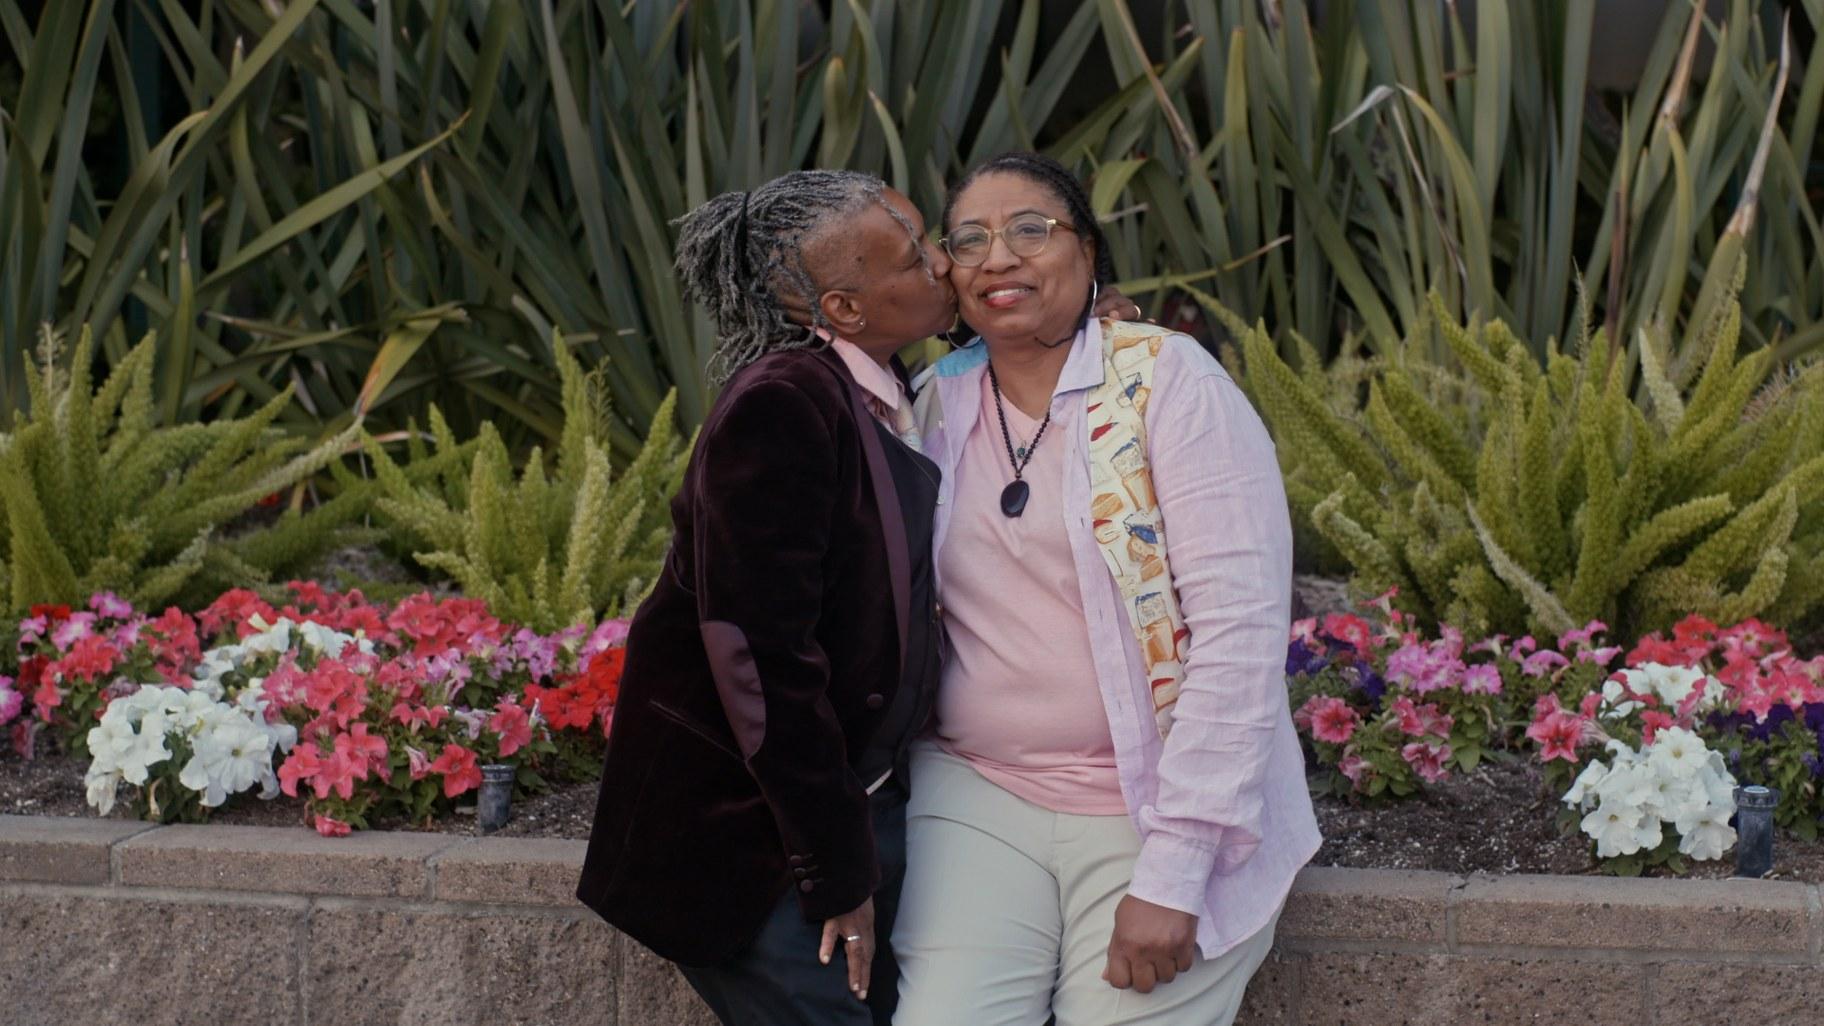 Senior Prom_Sheah_Koko_kissing.jpg